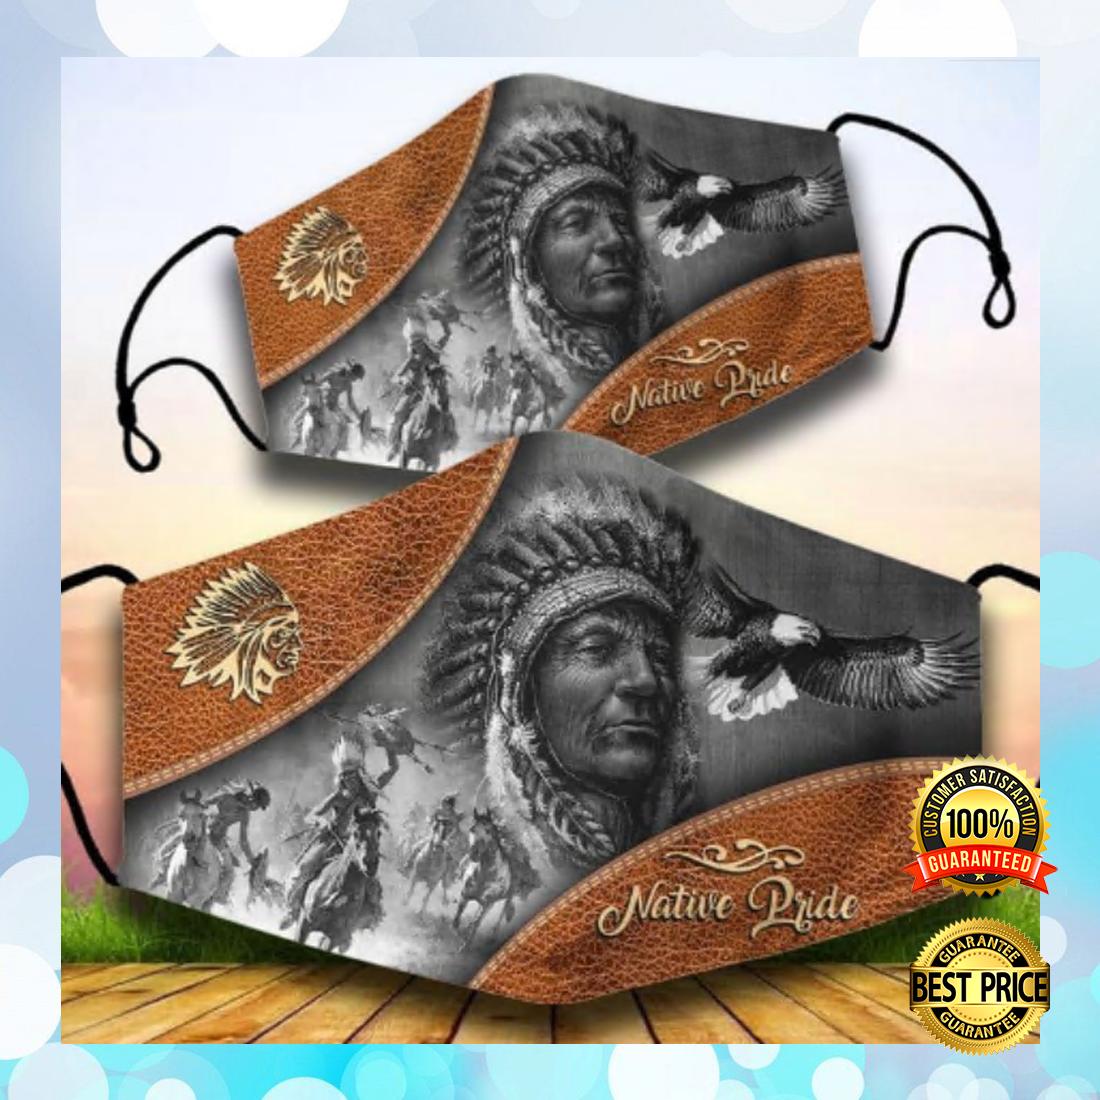 [New] Native Pride Face Mask